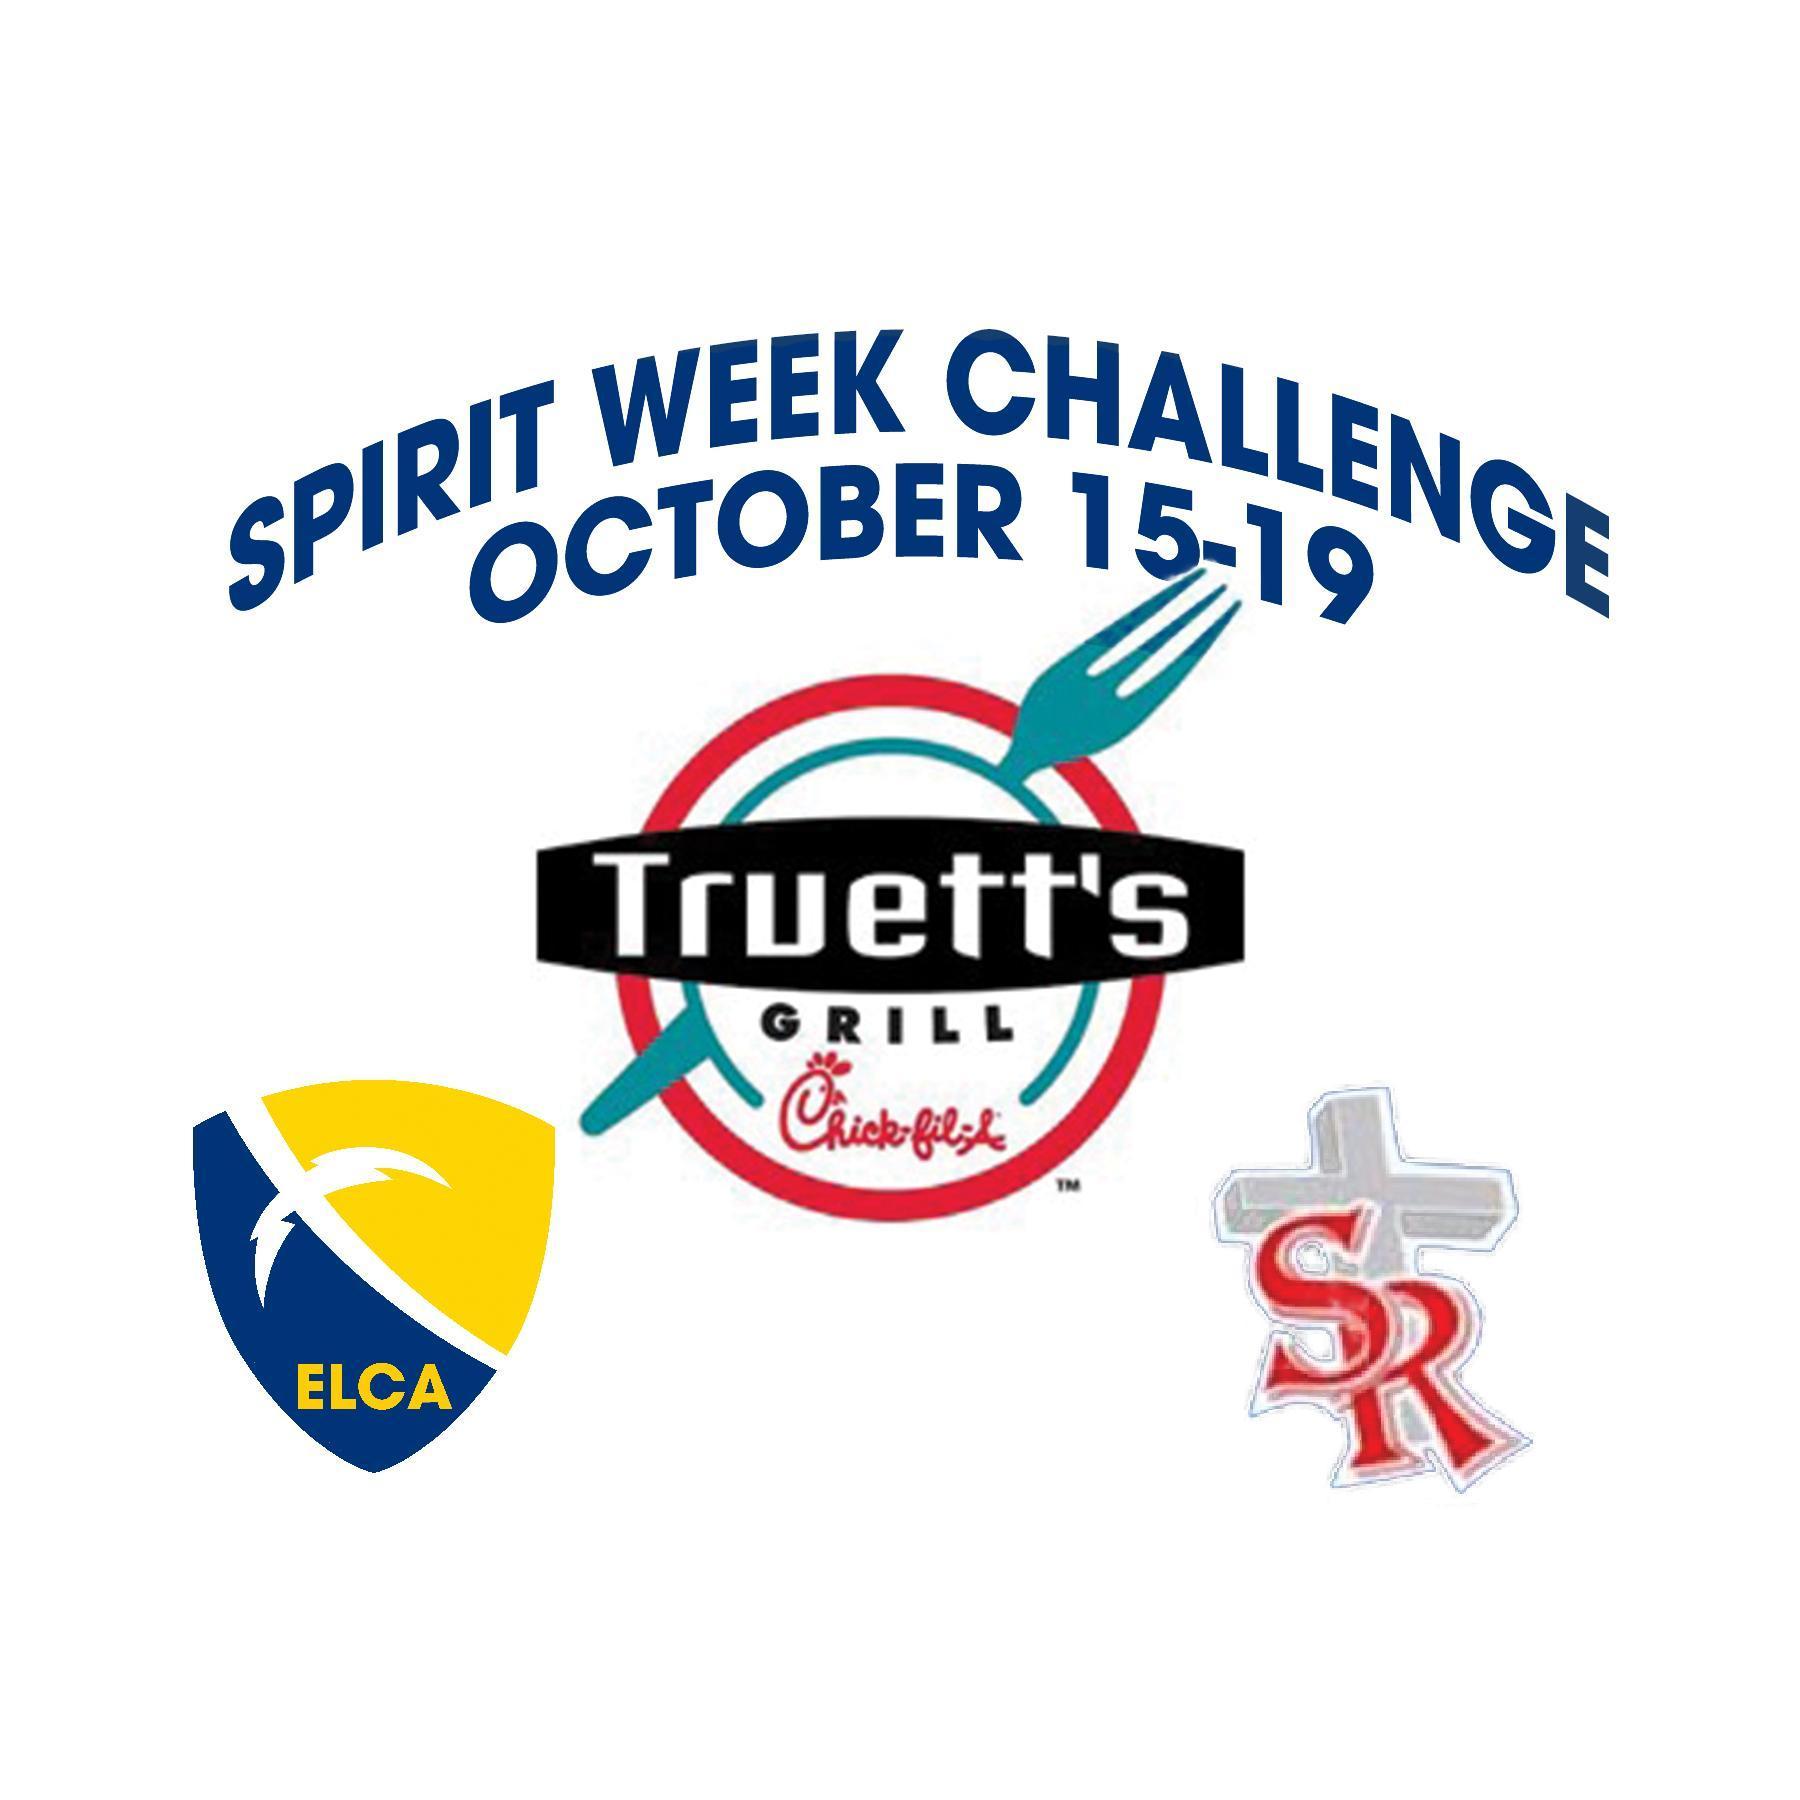 Truett's Grill Spirit Week Challenge! Image